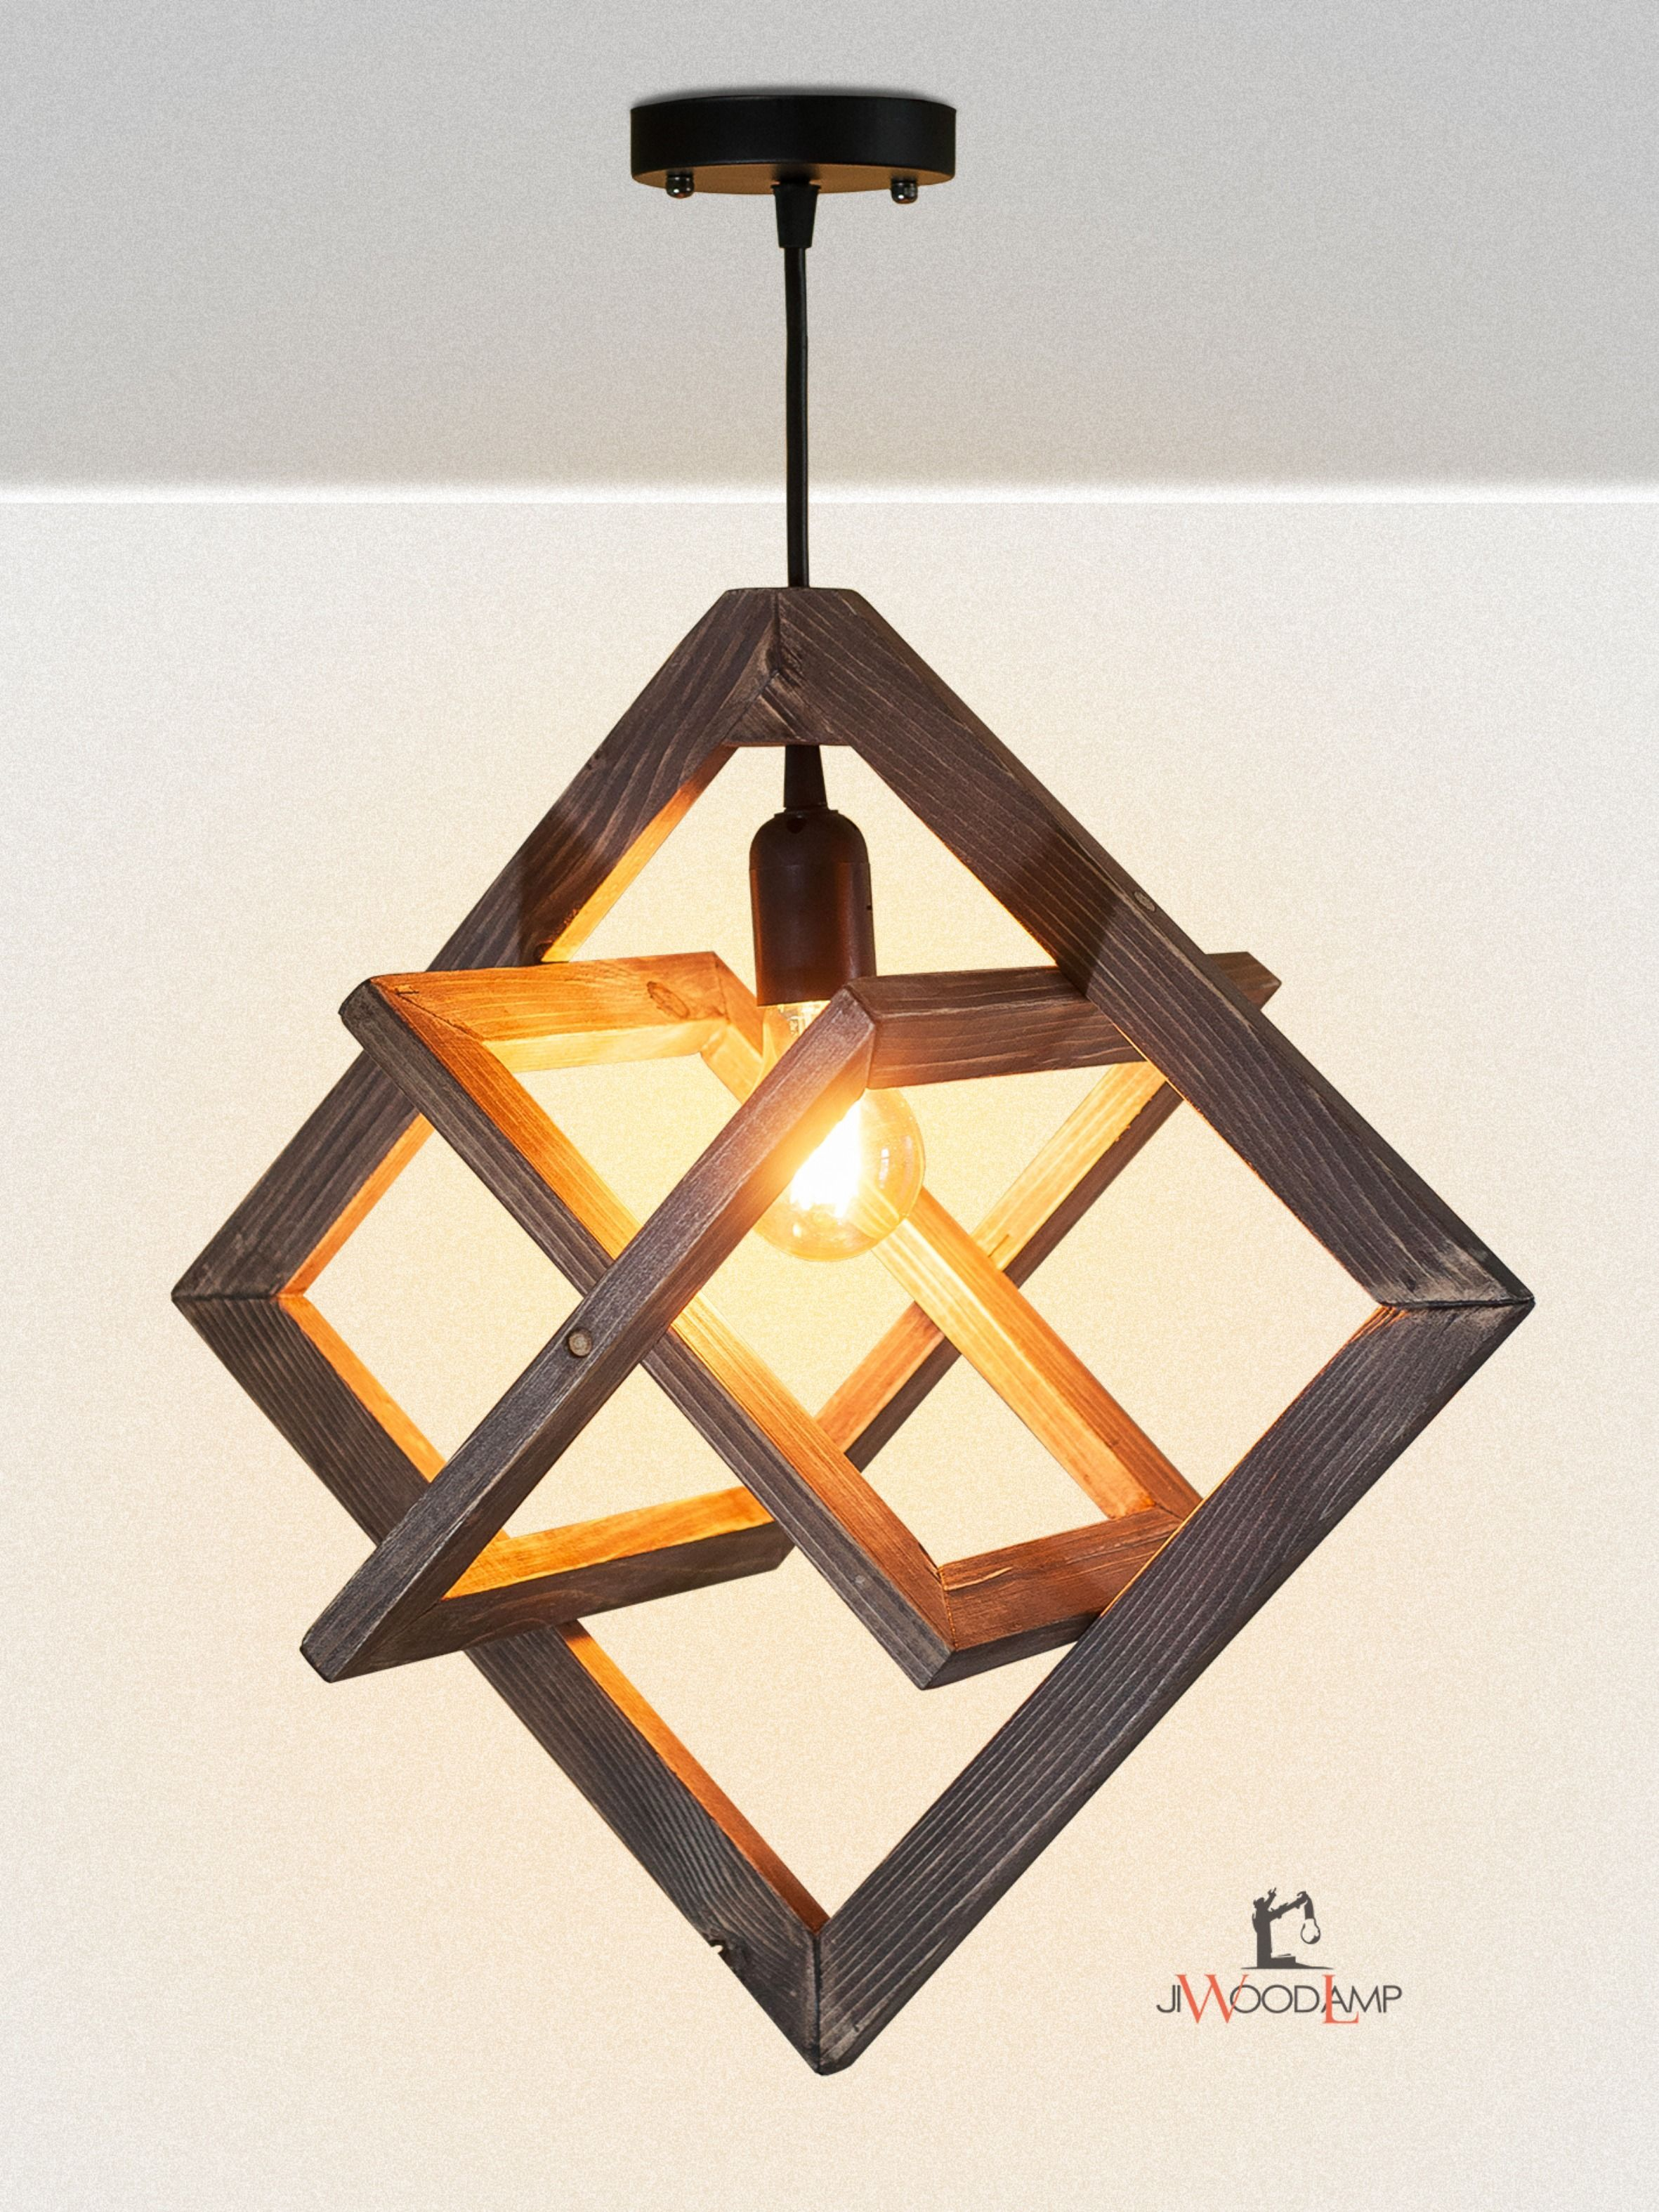 Wooden hanging lamp, Wood lamp, Pendant lighting, Wooden